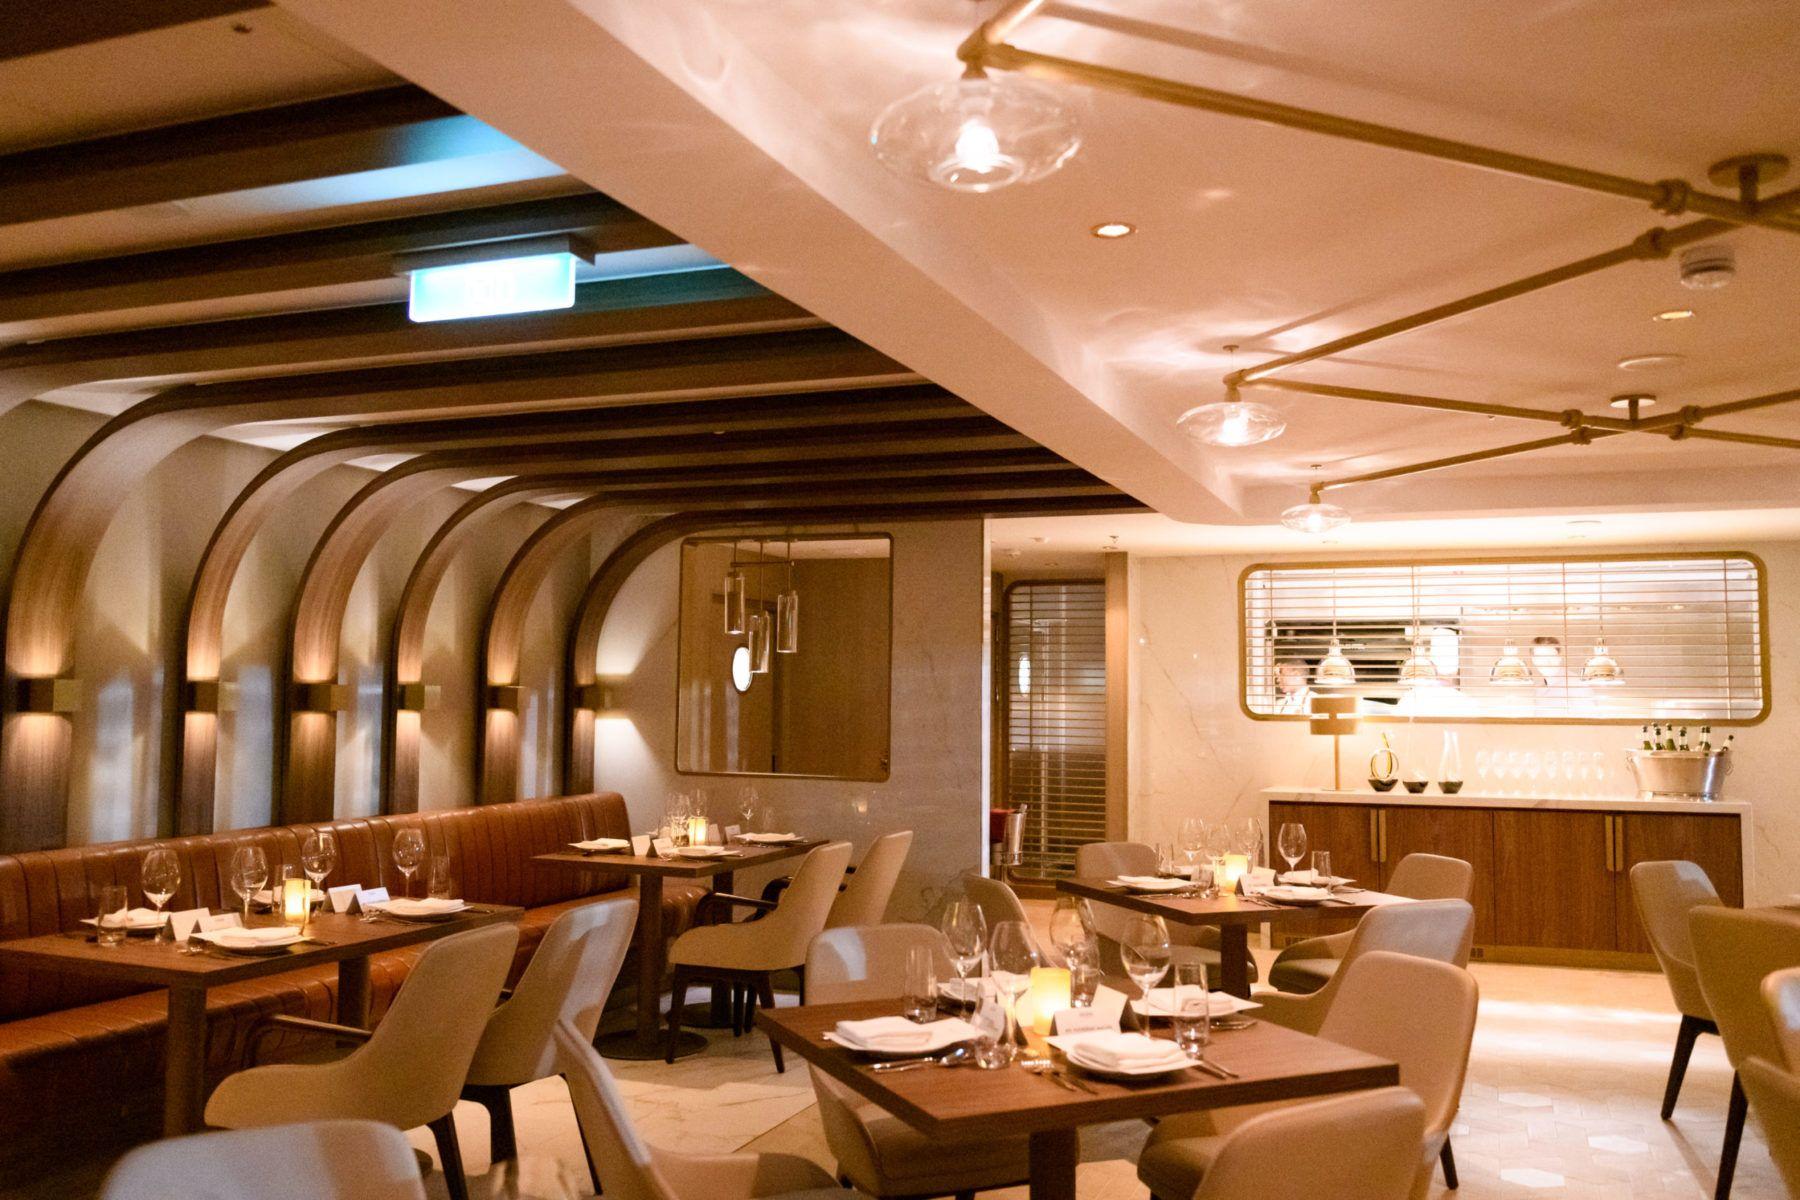 Interior of Onda by Scarpetta restaurant